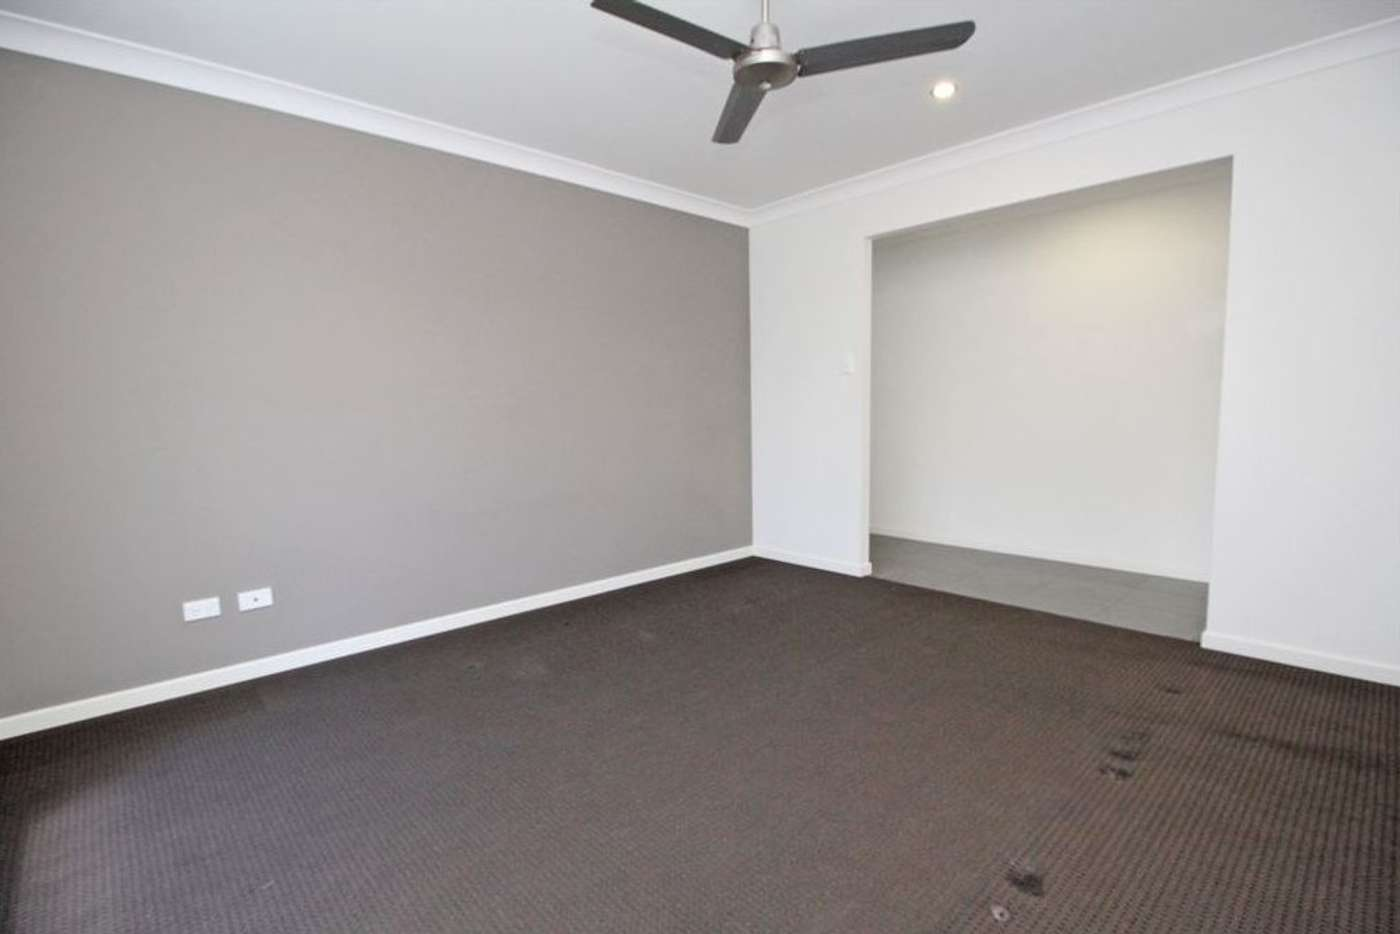 Sixth view of Homely house listing, 8 Denman Drive, Bundamba QLD 4304